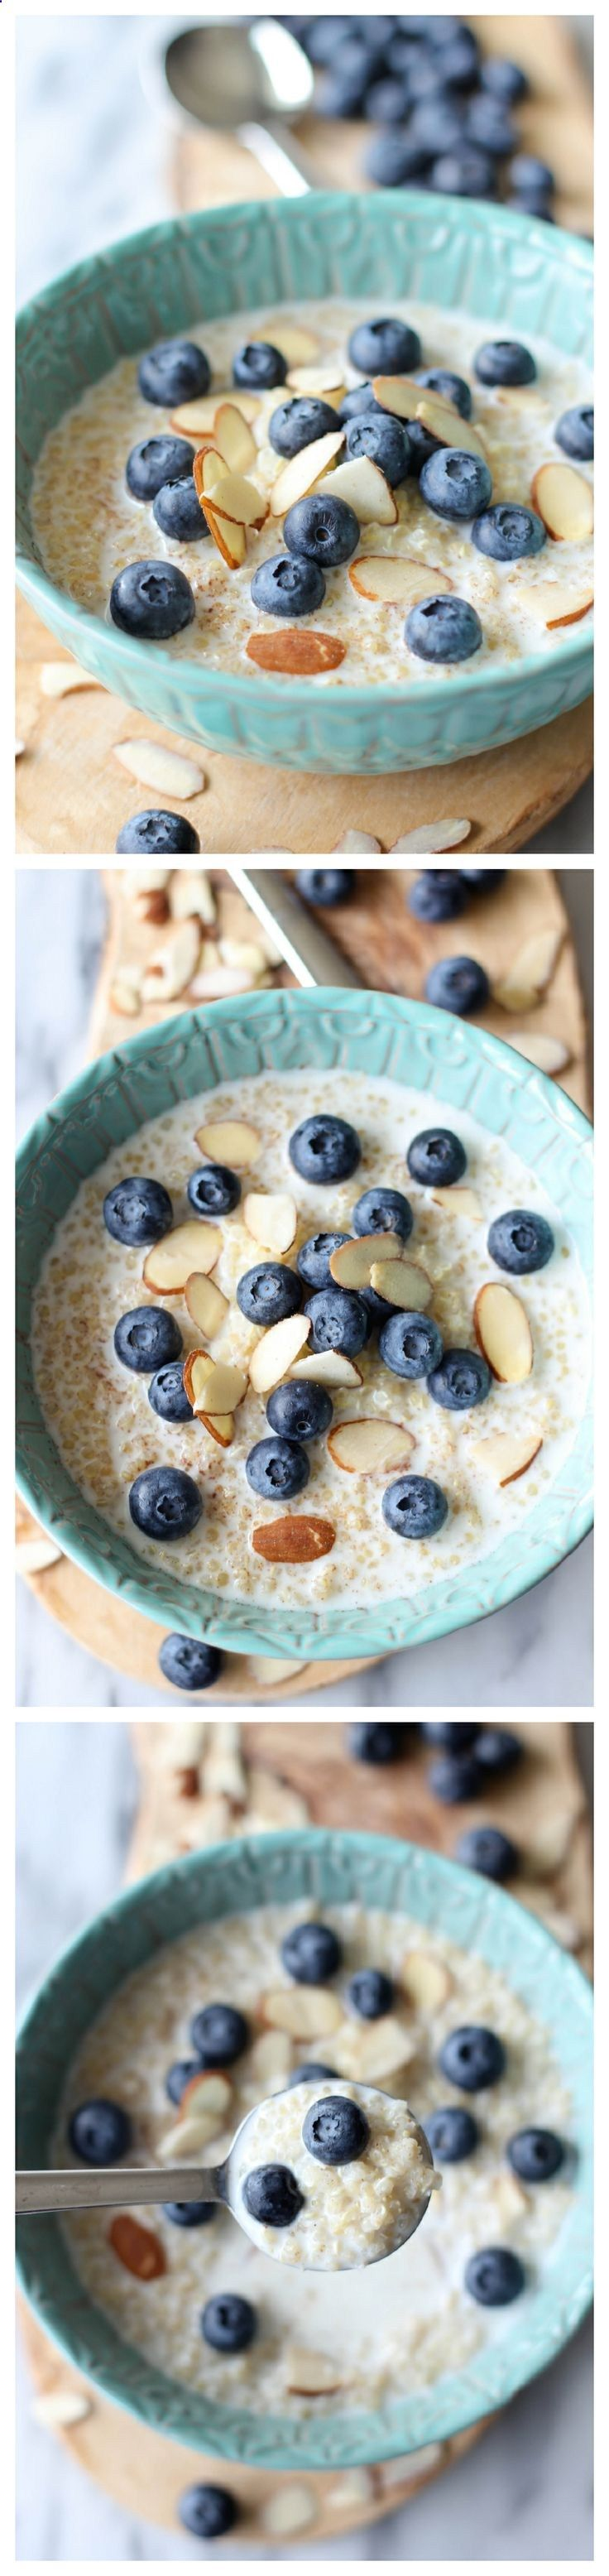 Blueberry Breakfast Quinoa Protein Packed Breakfast